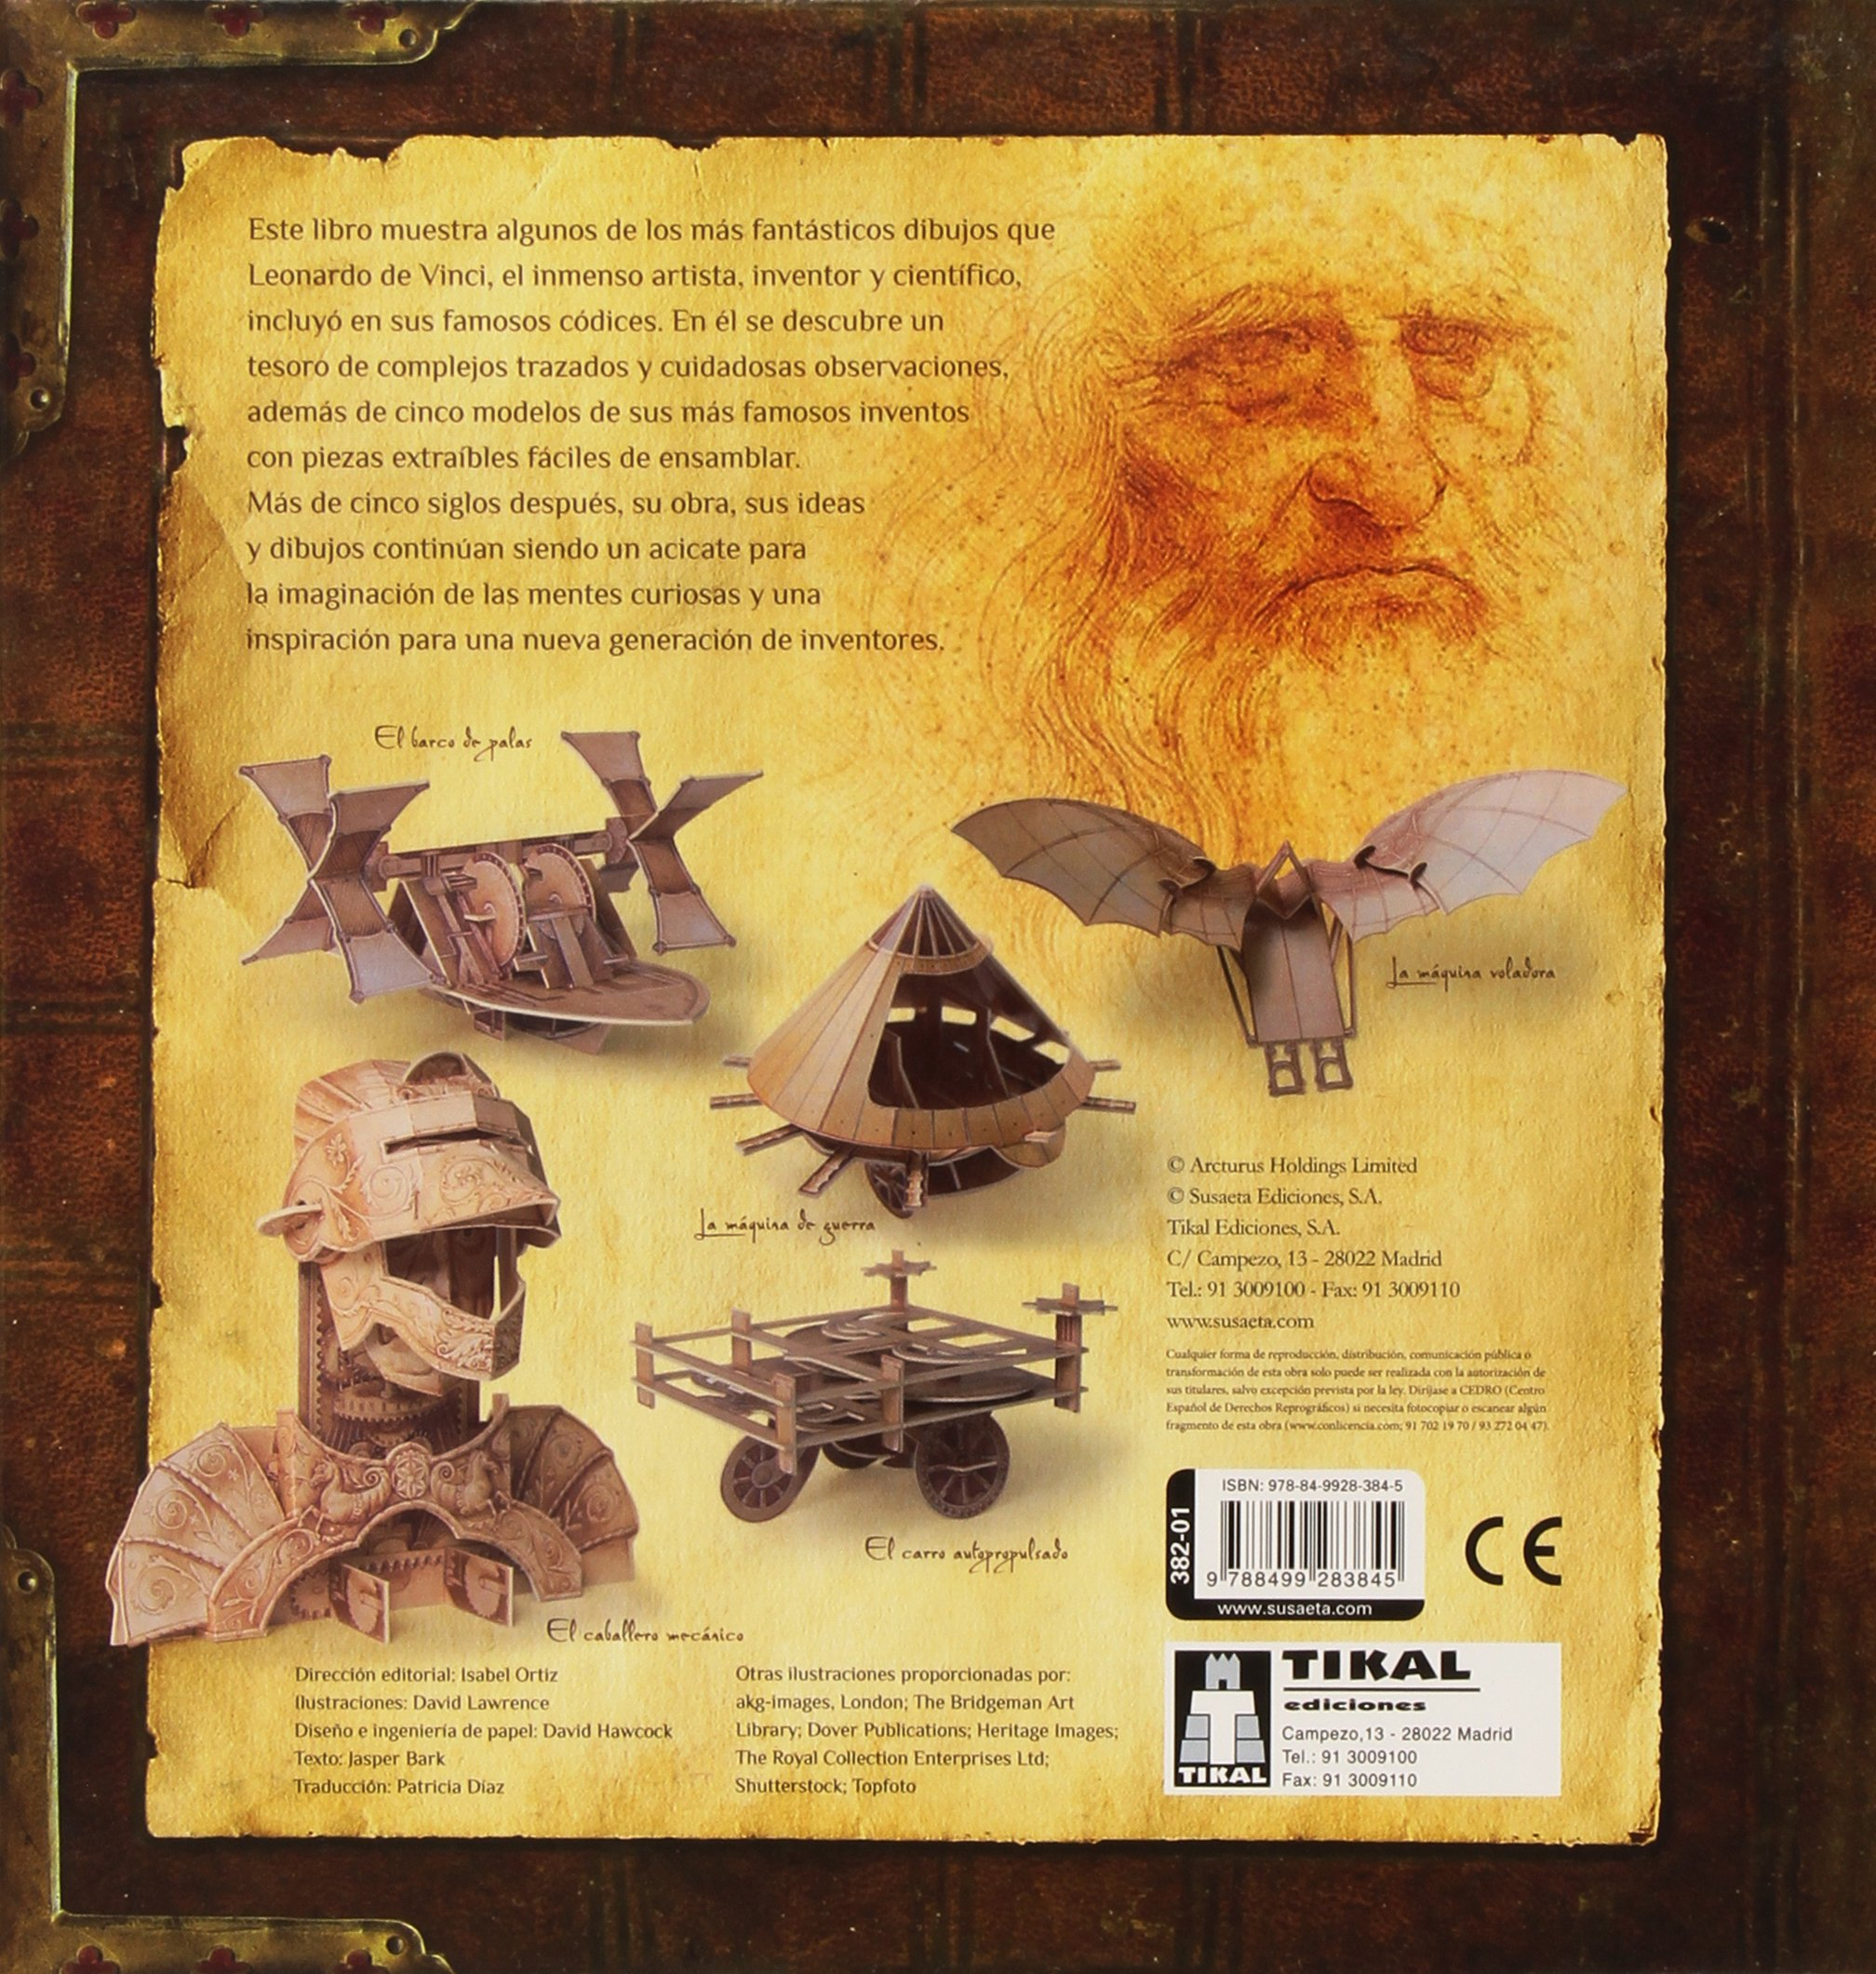 Inventos Leonardo Da Vinci Modelos Para Armar Spanish Edition Bark Jasper Lawrence David 9788499283845 Books